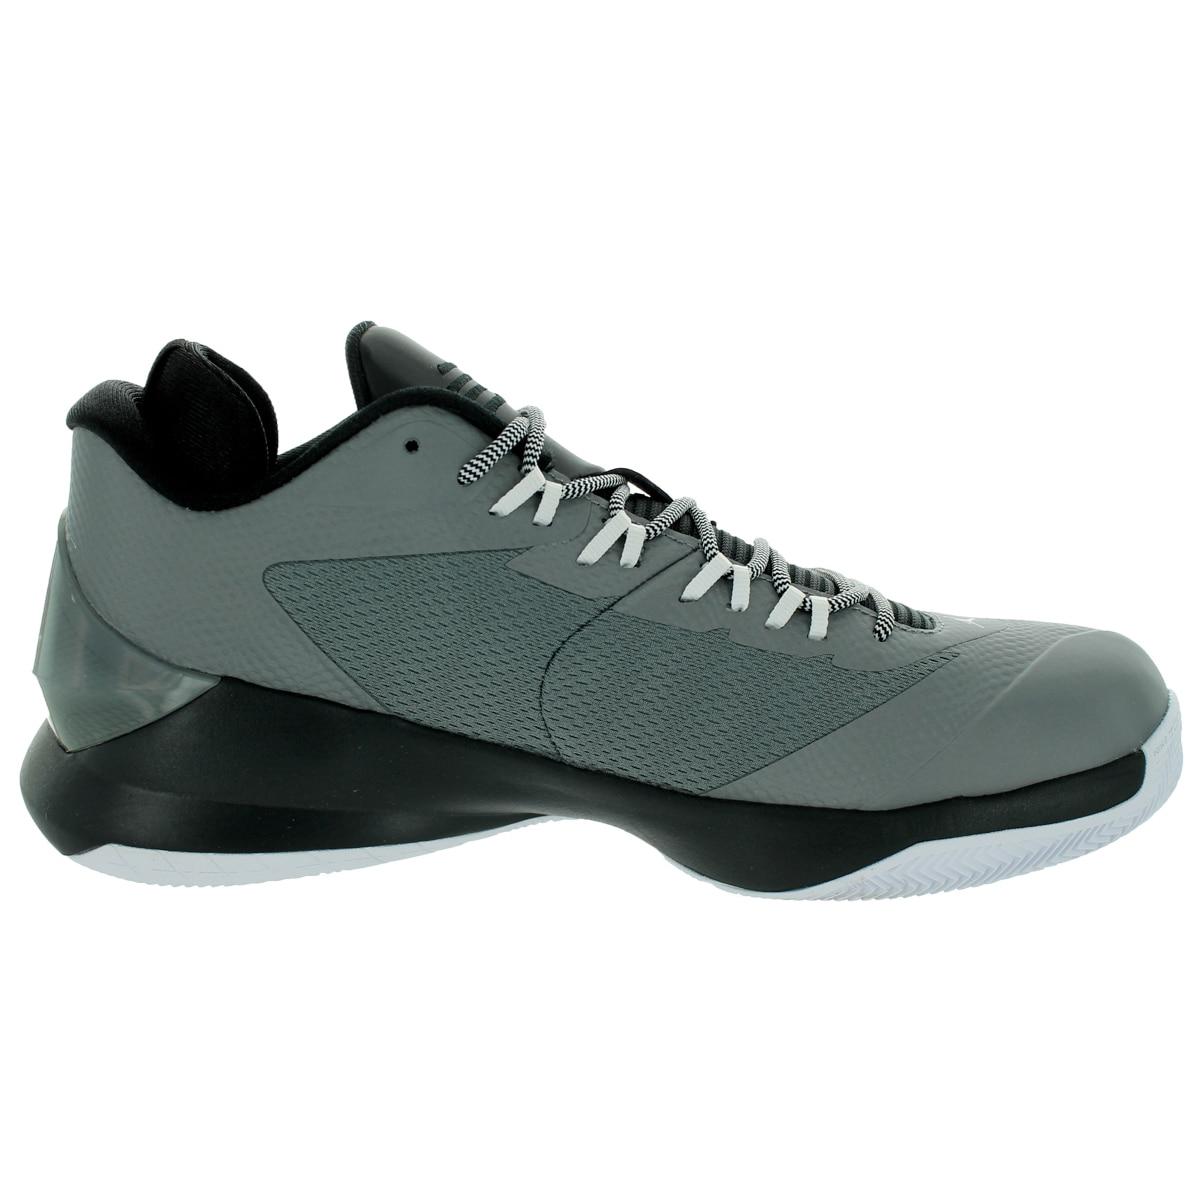 77213df08093 Shop Nike Men s Jordan CP3.VIII Grey Basketball Shoes - Free Shipping Today  - Overstock.com - 13984140